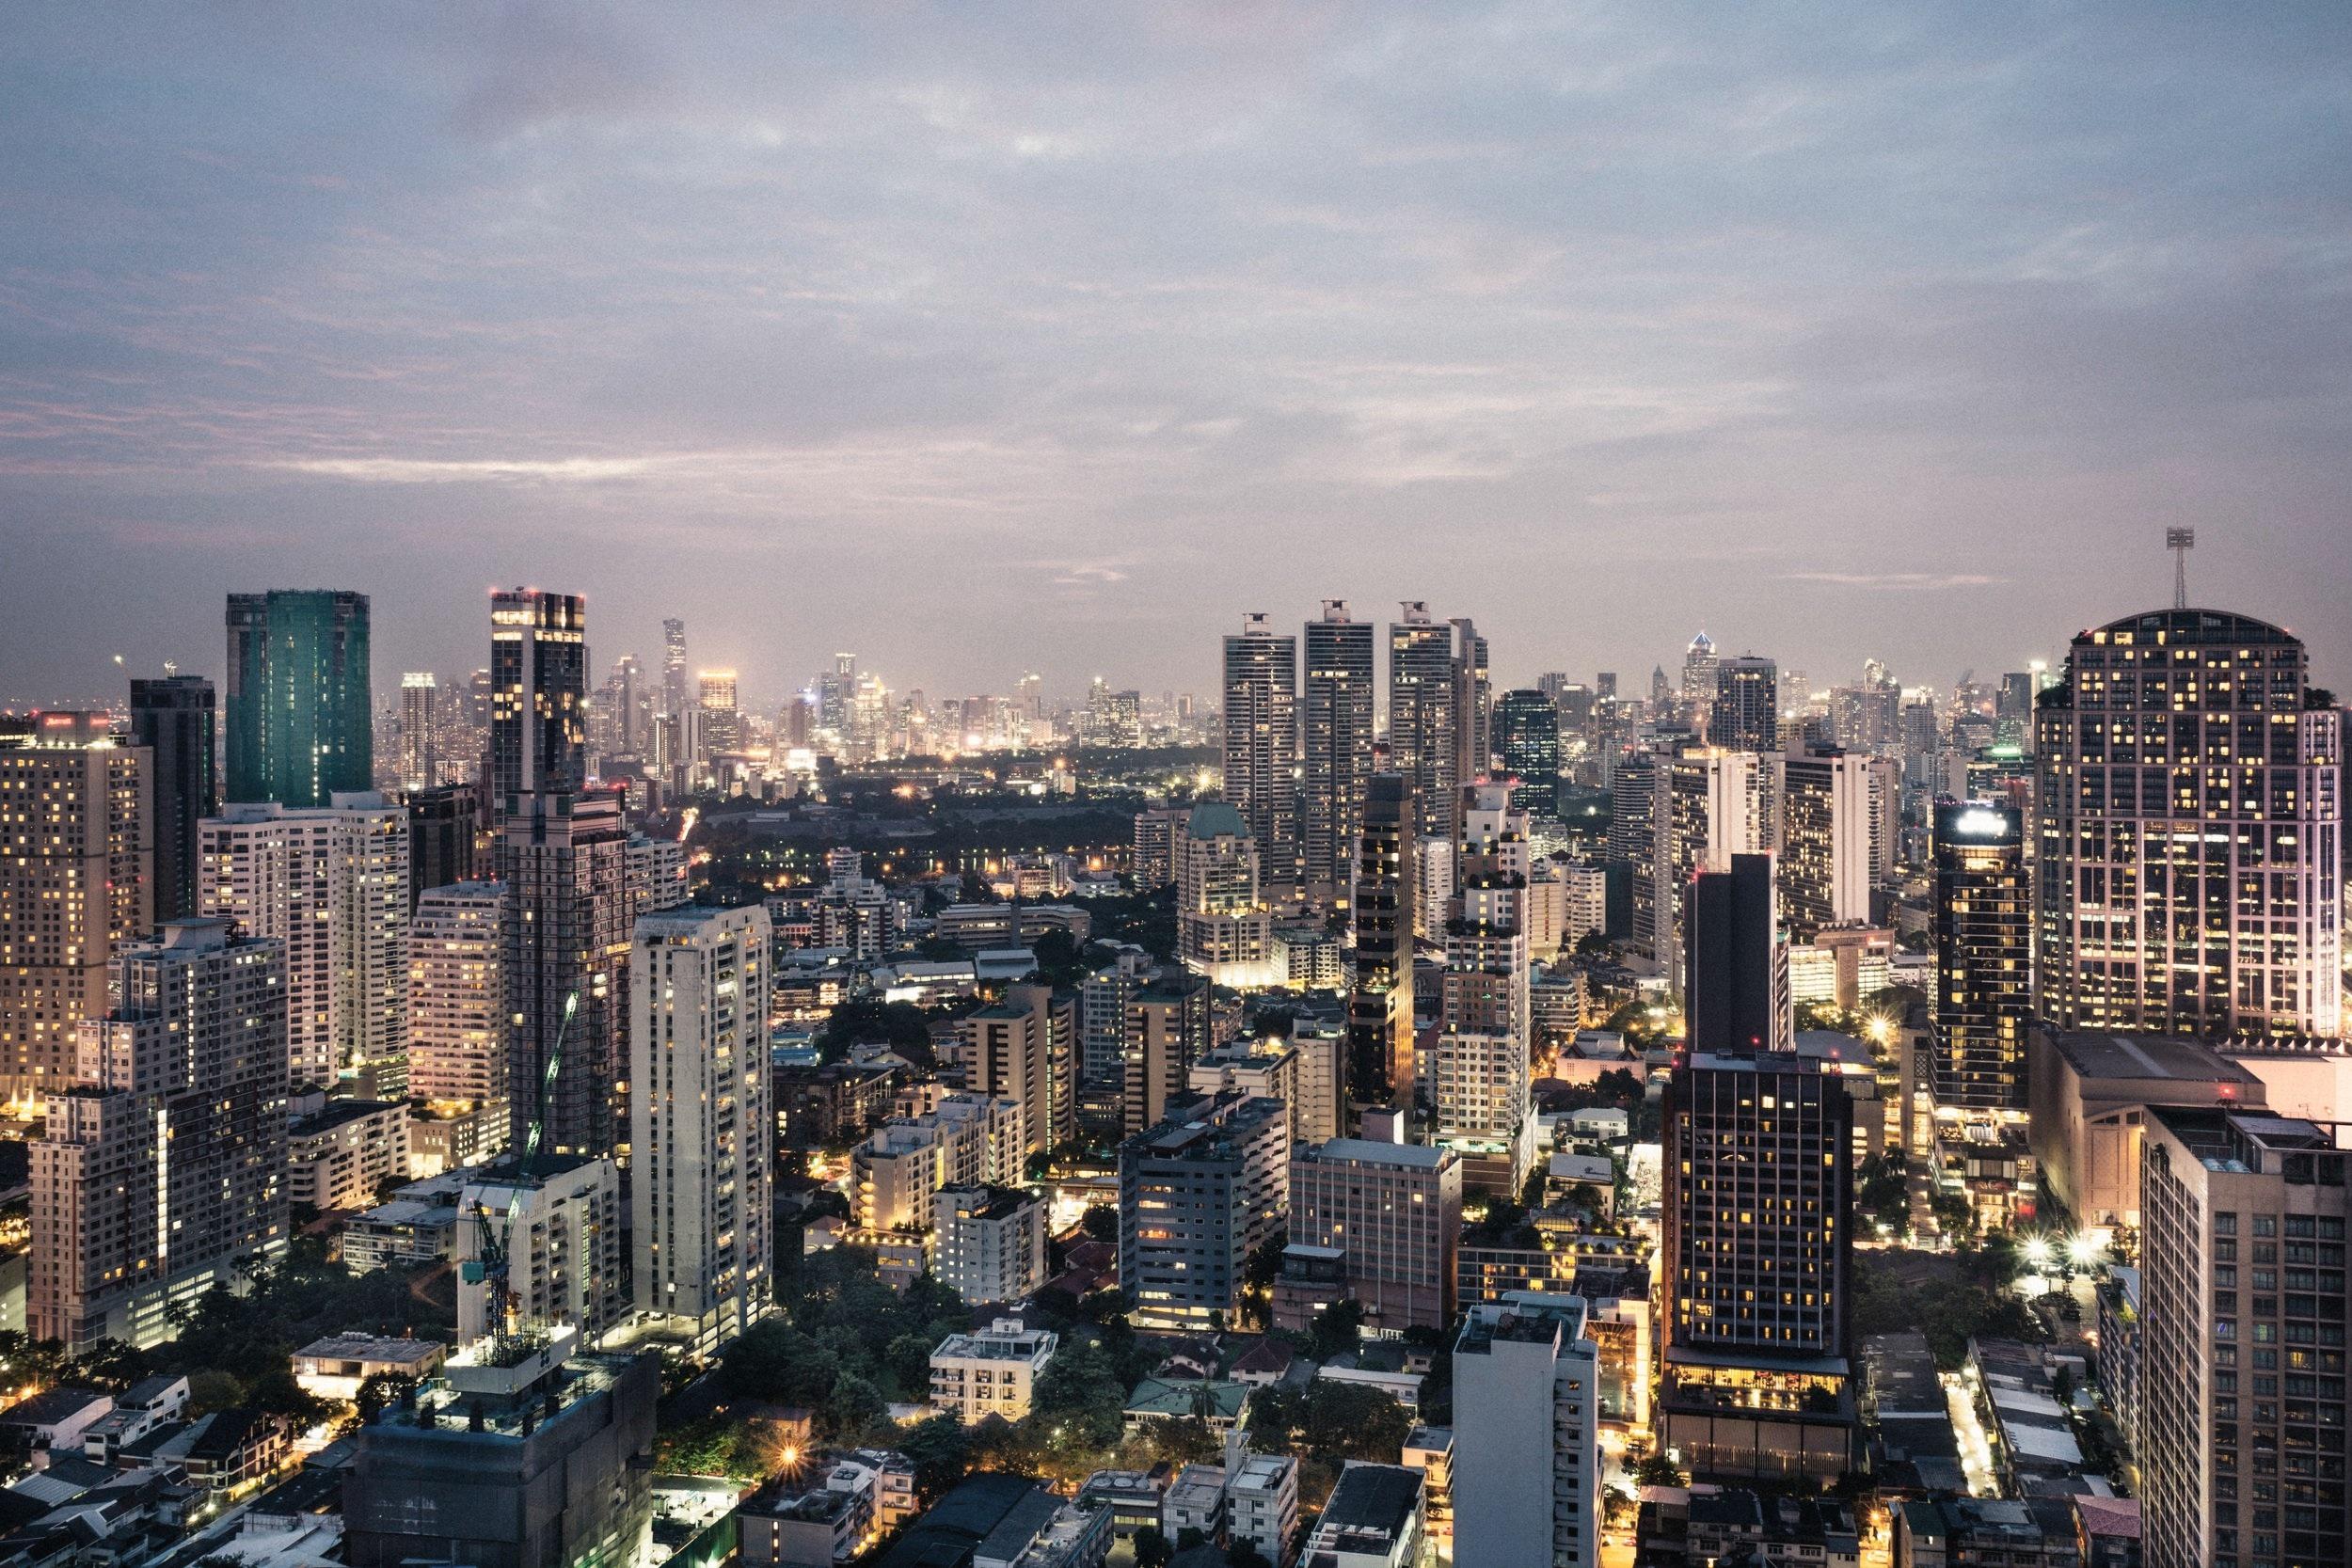 Key Benefits - Real-time AVMs | Current or historical estimates | Customisable property attributes | Rental Estimates